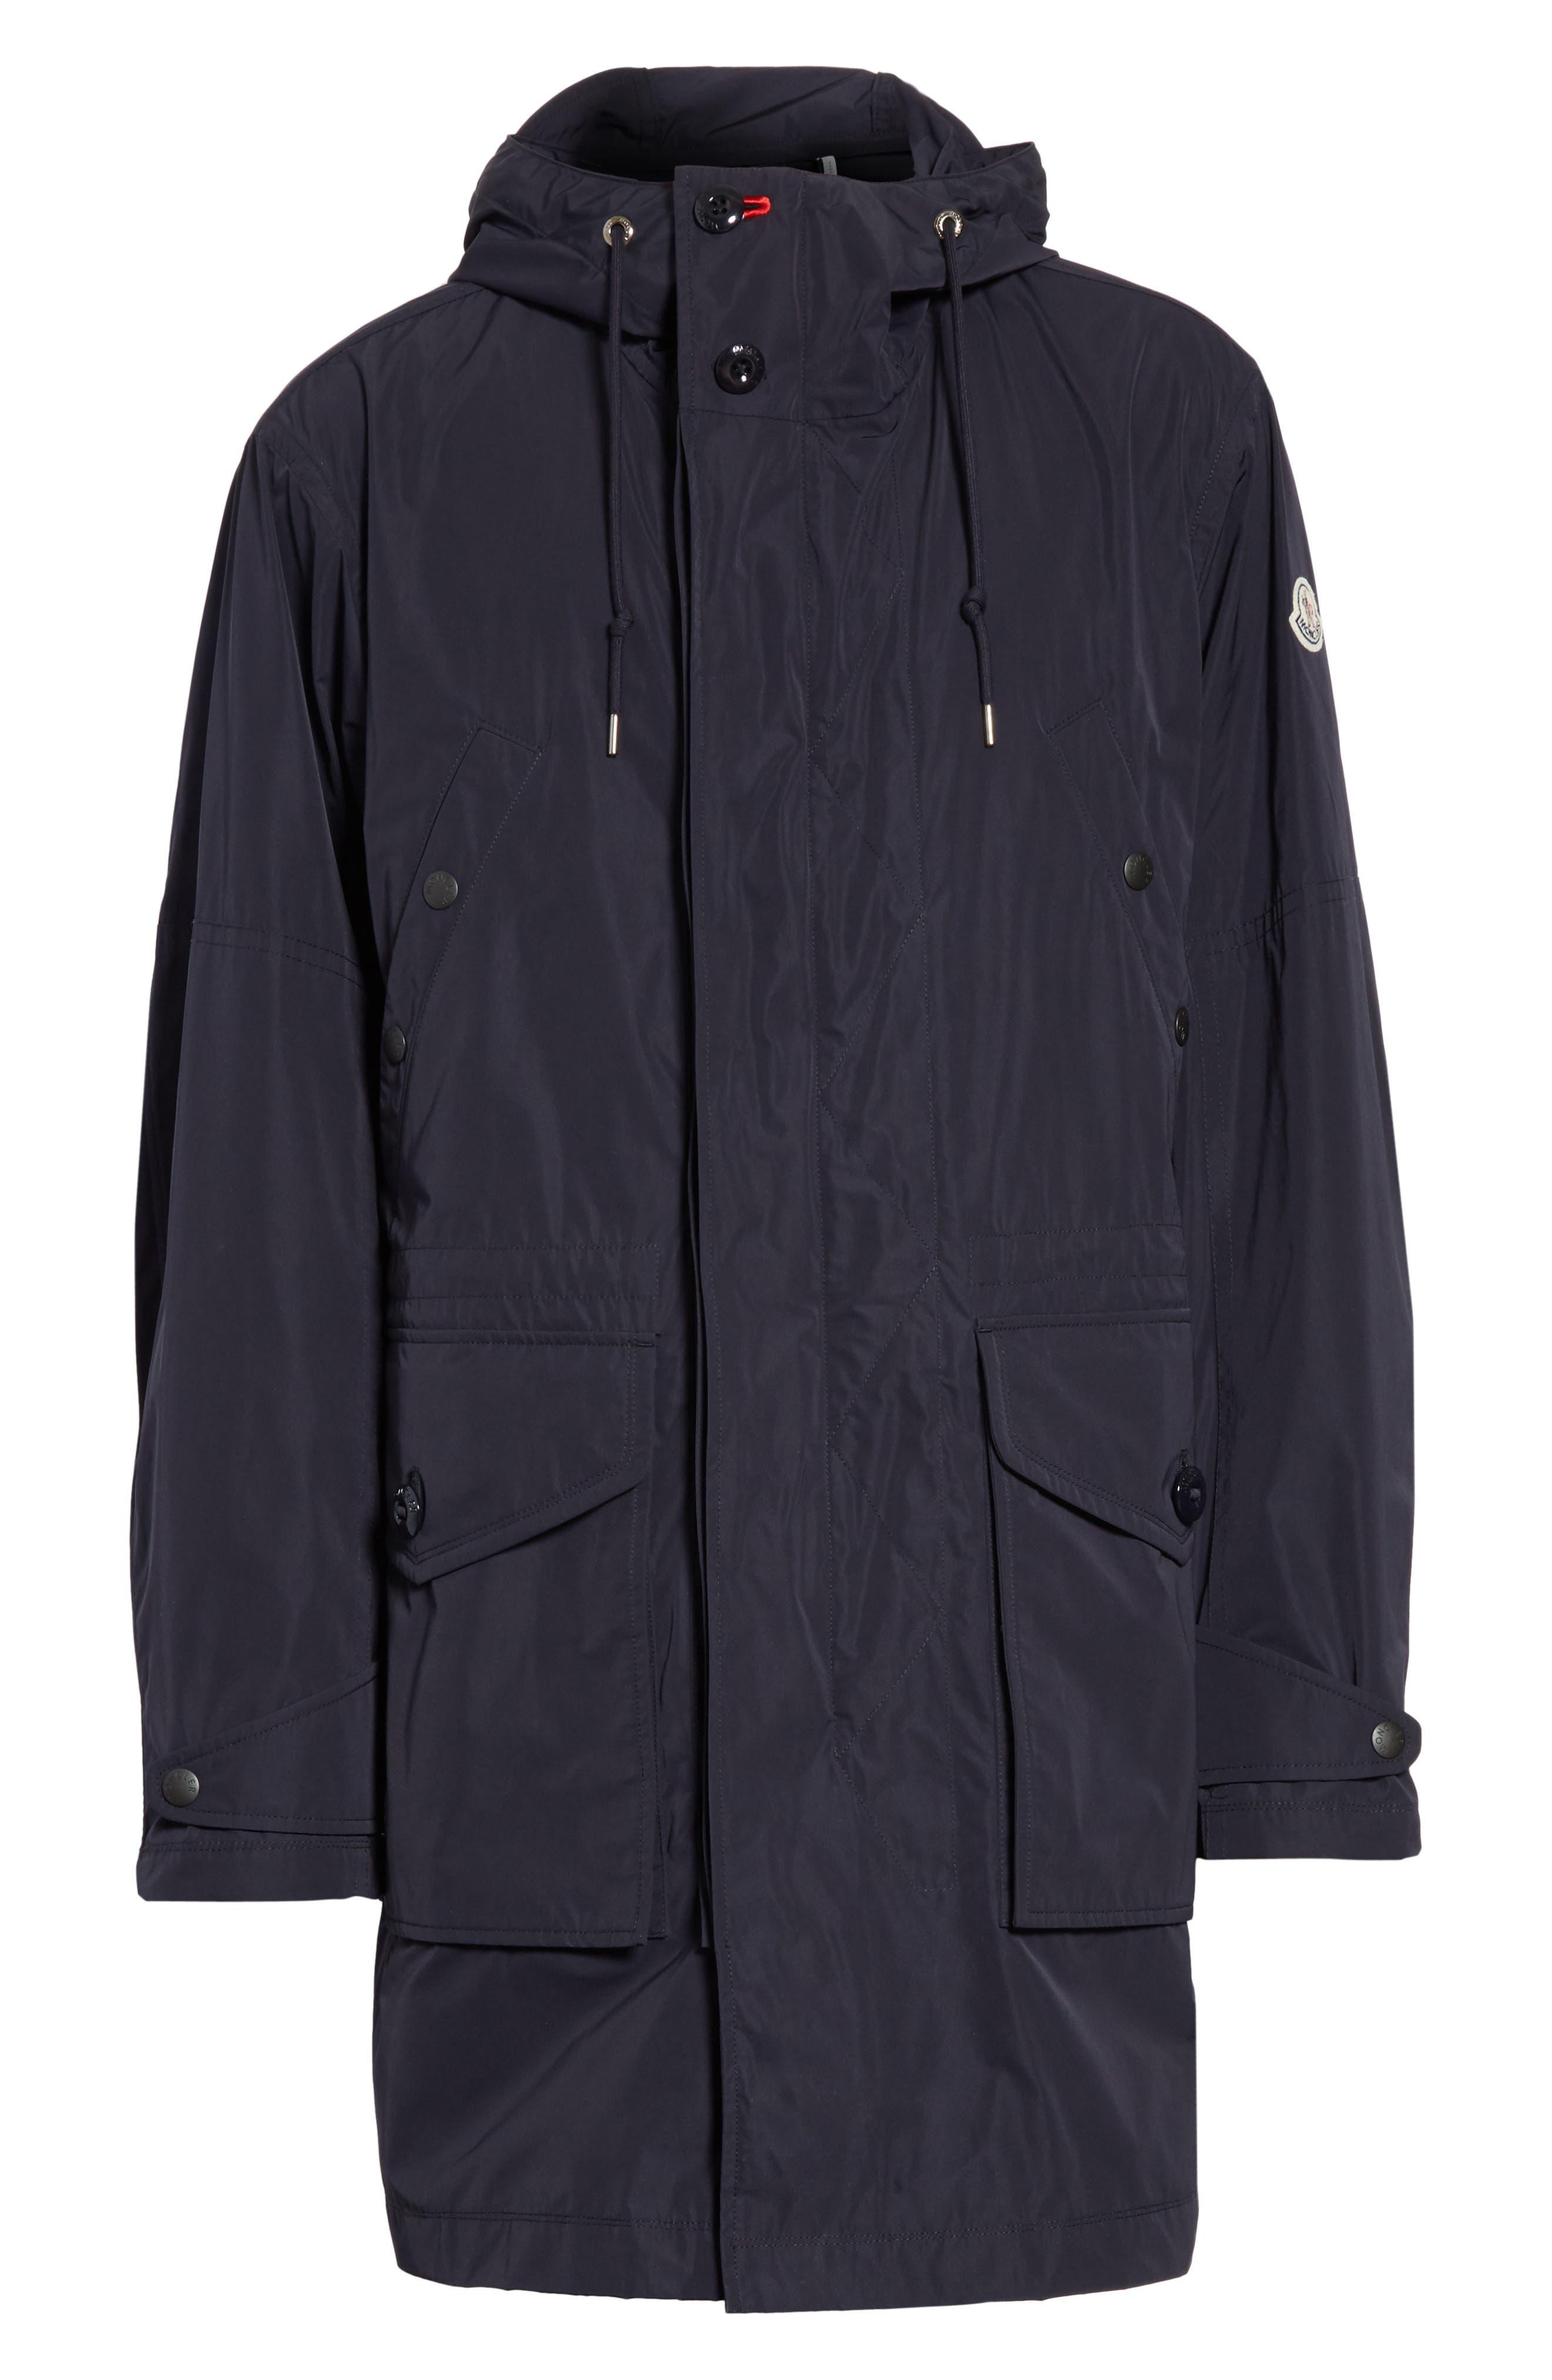 Guiers Long Raincoat,                             Alternate thumbnail 5, color,                             419